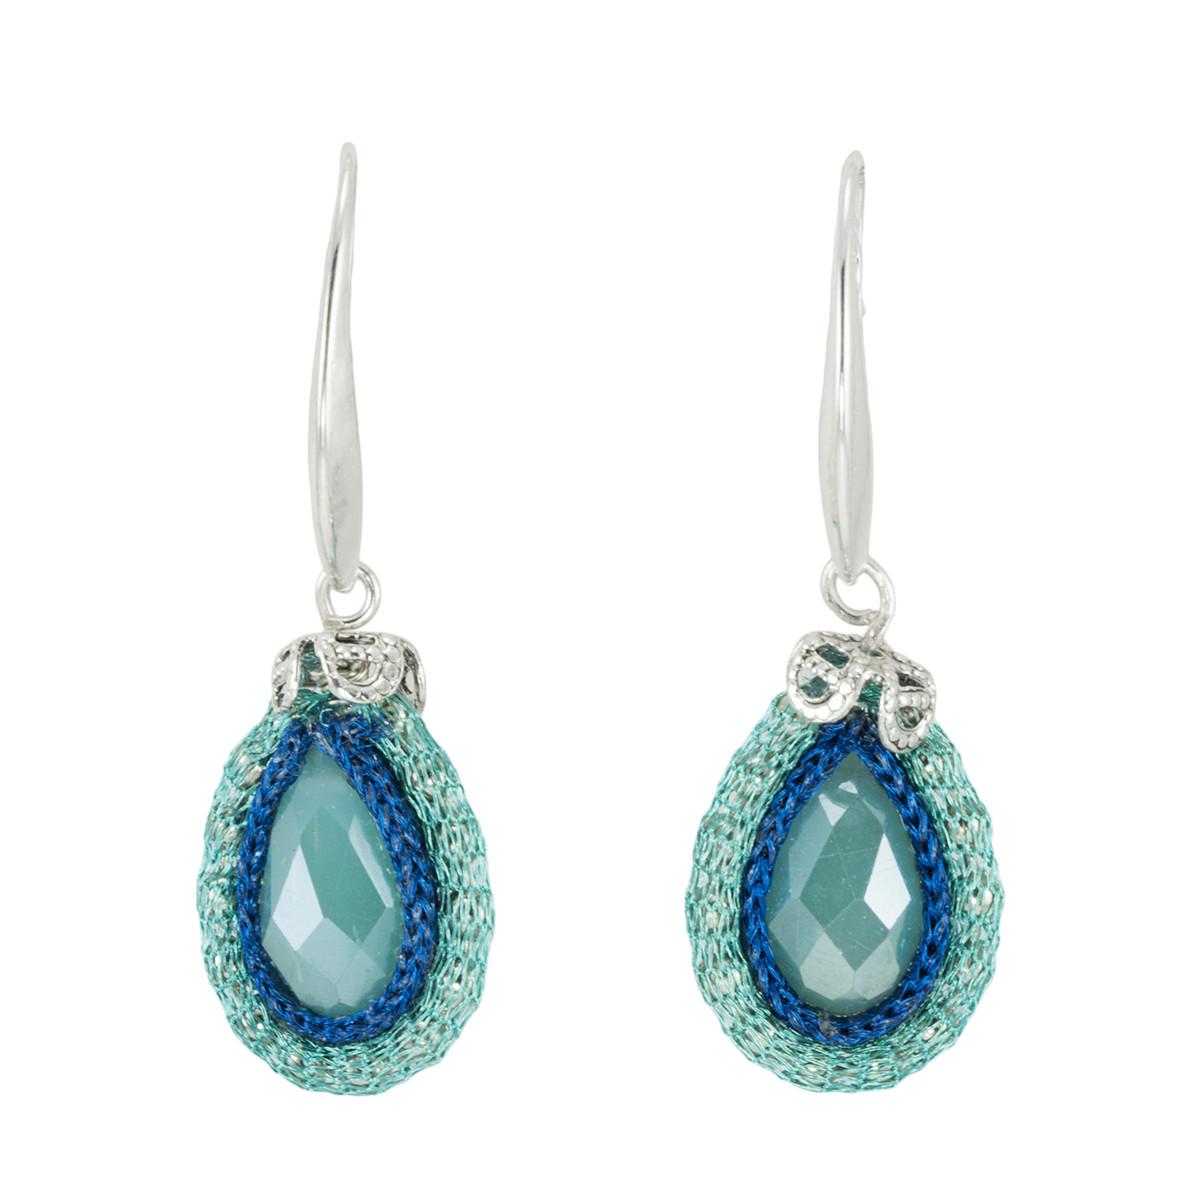 Blue Light Blue Joy Nouveau Glam earrings from Anat Jewelry